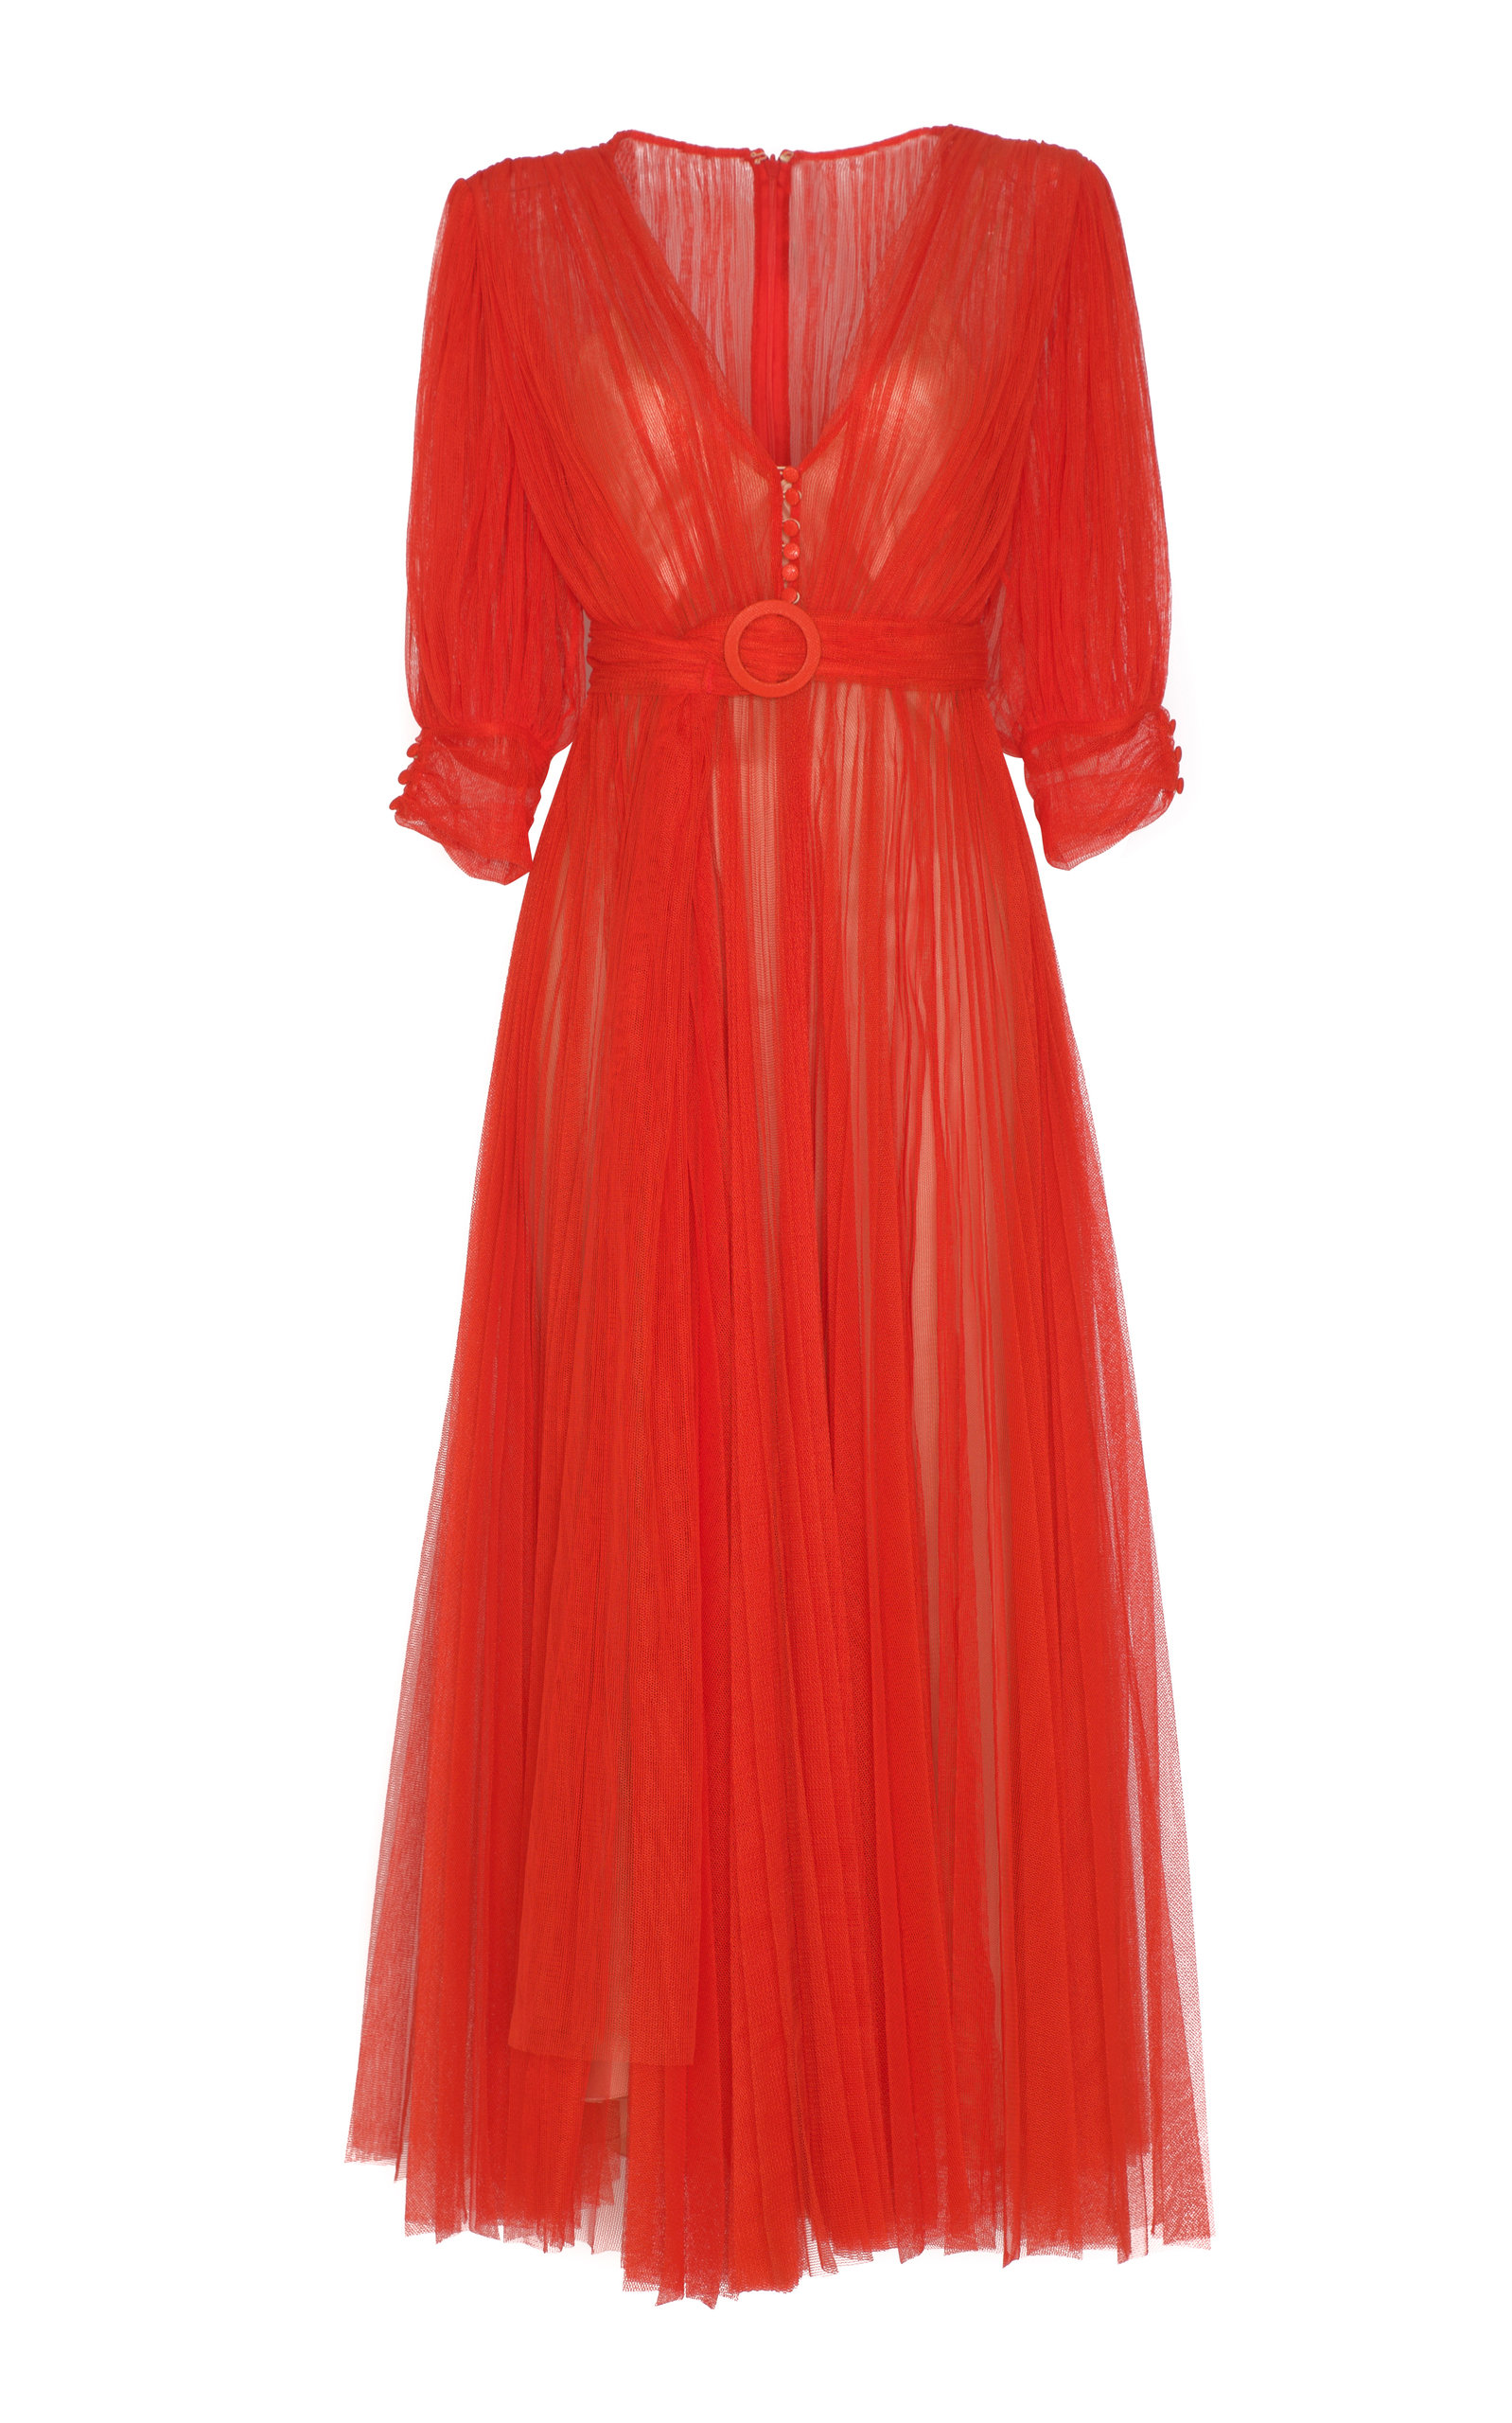 MARIA LUCIA HOHAN AMINAH PLEATED TULLE DRESS